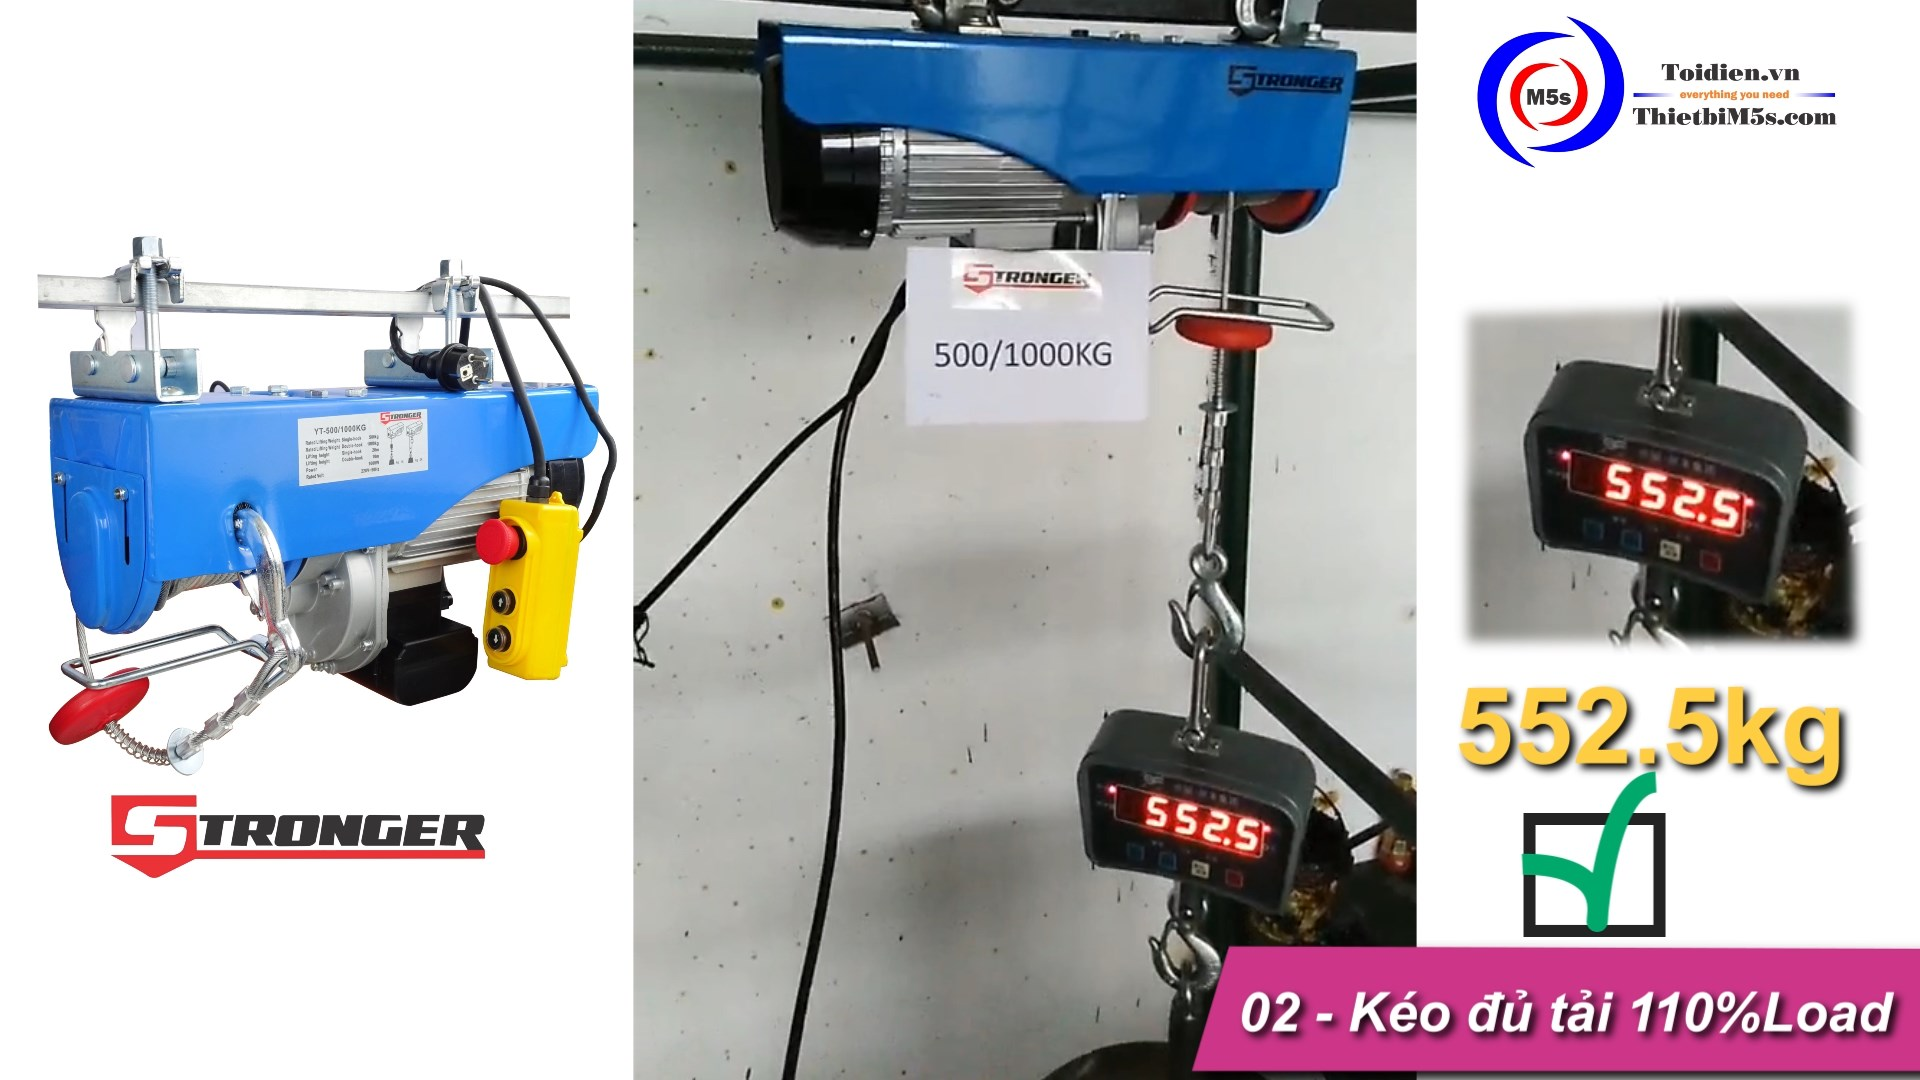 TỜI ĐIỆN MINI 500-1000KG STRONGER